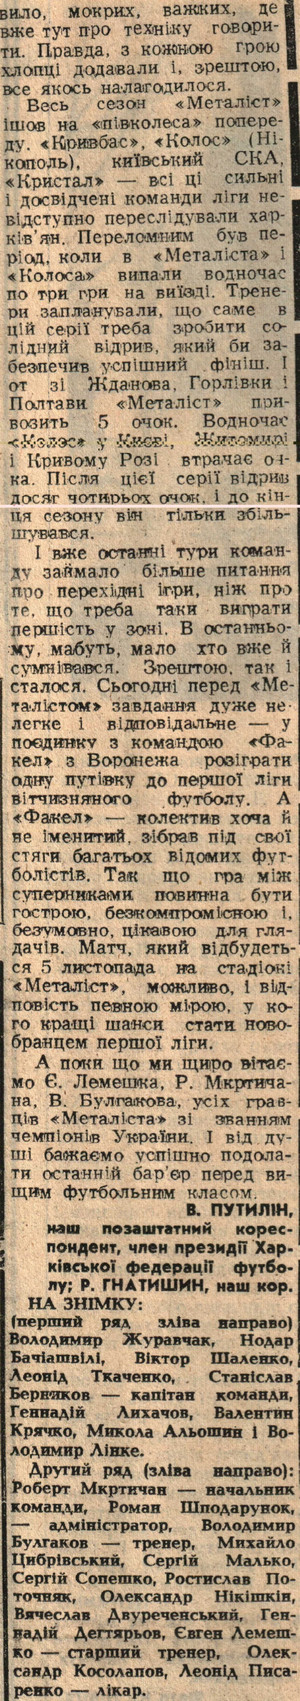 [Изображение: 1978_MKh-championUSSR_02.jpg]